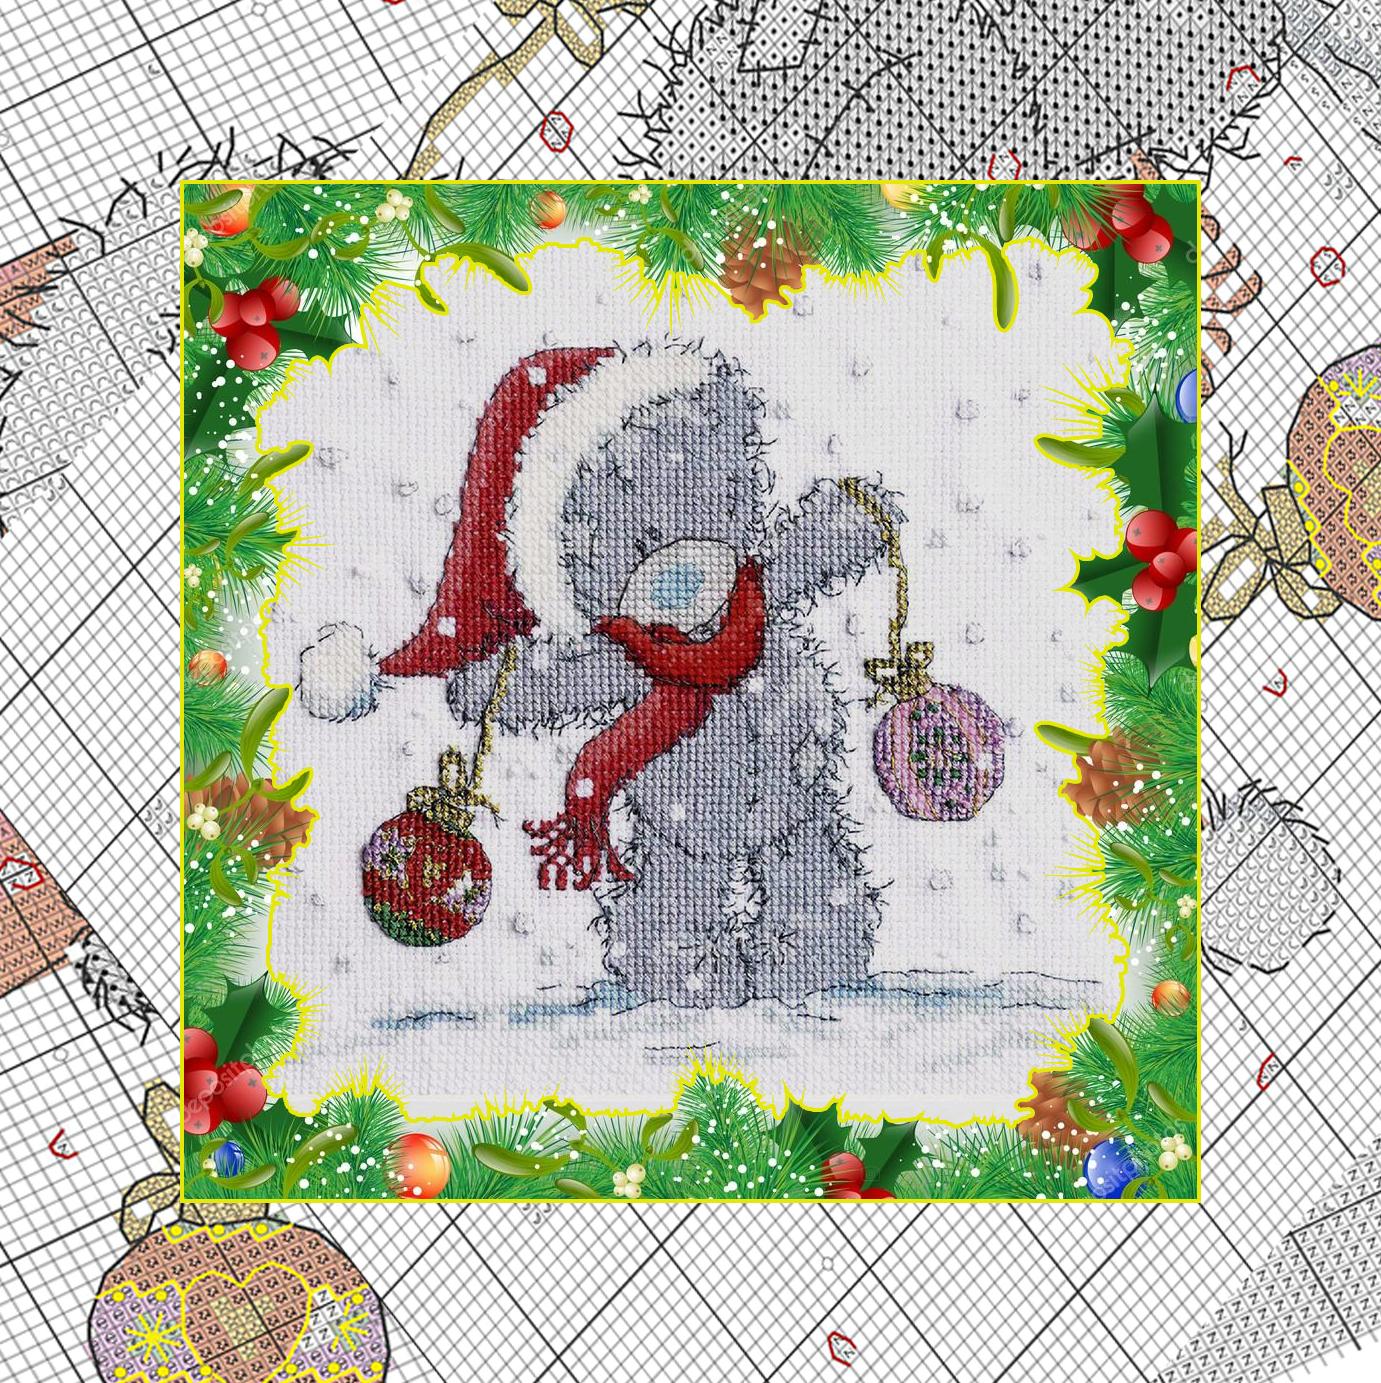 Free Christmas Embroidery Patterns Sad Christmas Teddy Bear Free Embroidery Pattern